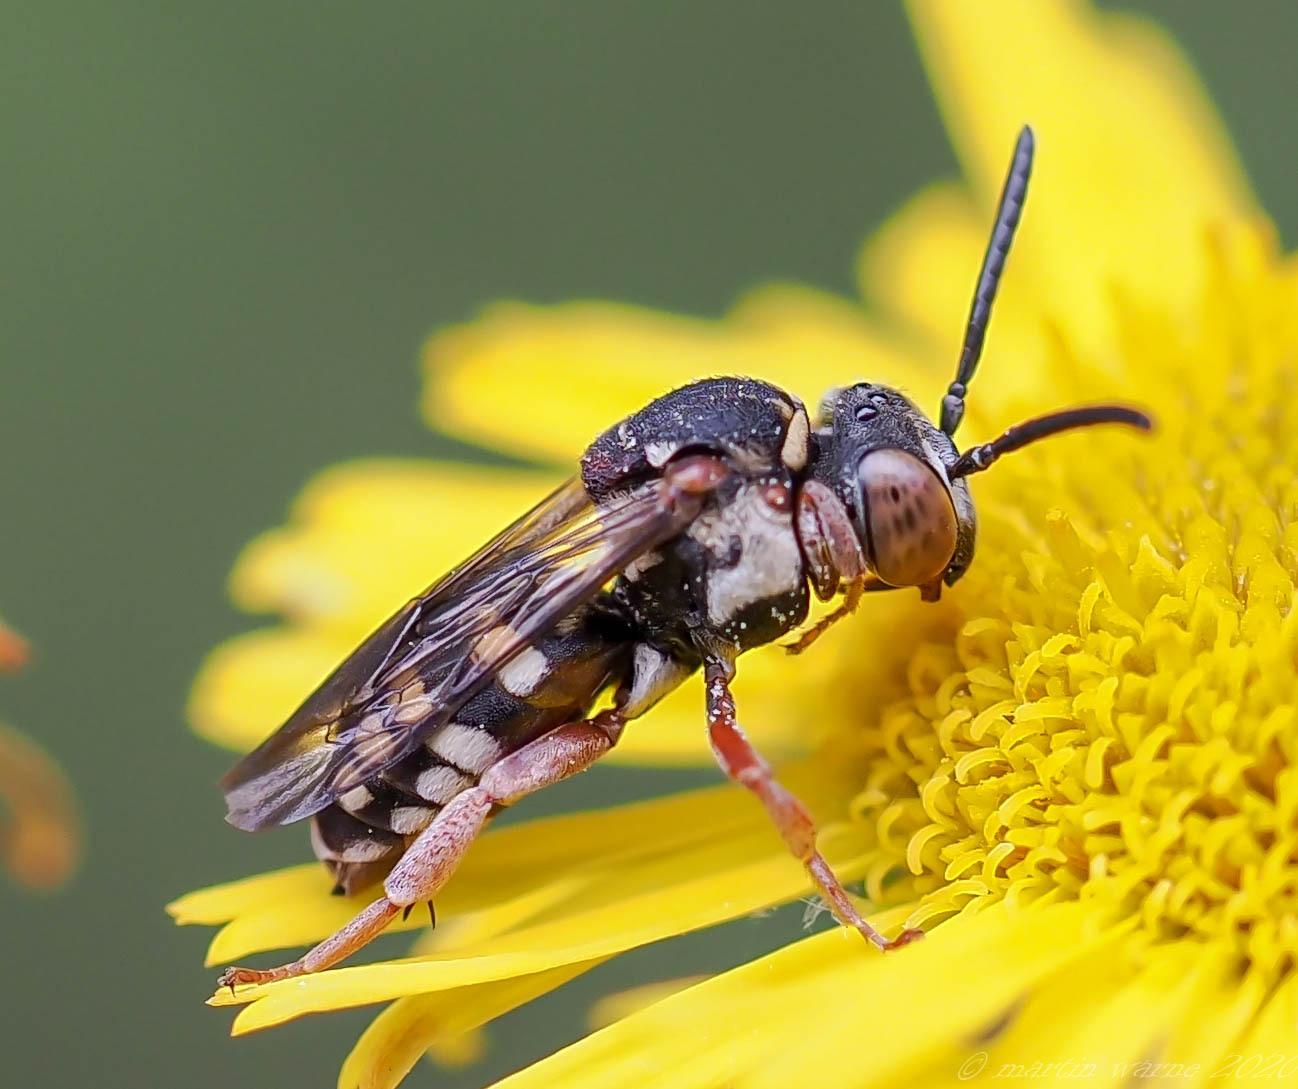 Epeolus-spp - Variegated Cuckoo Bees, Thorne Moor